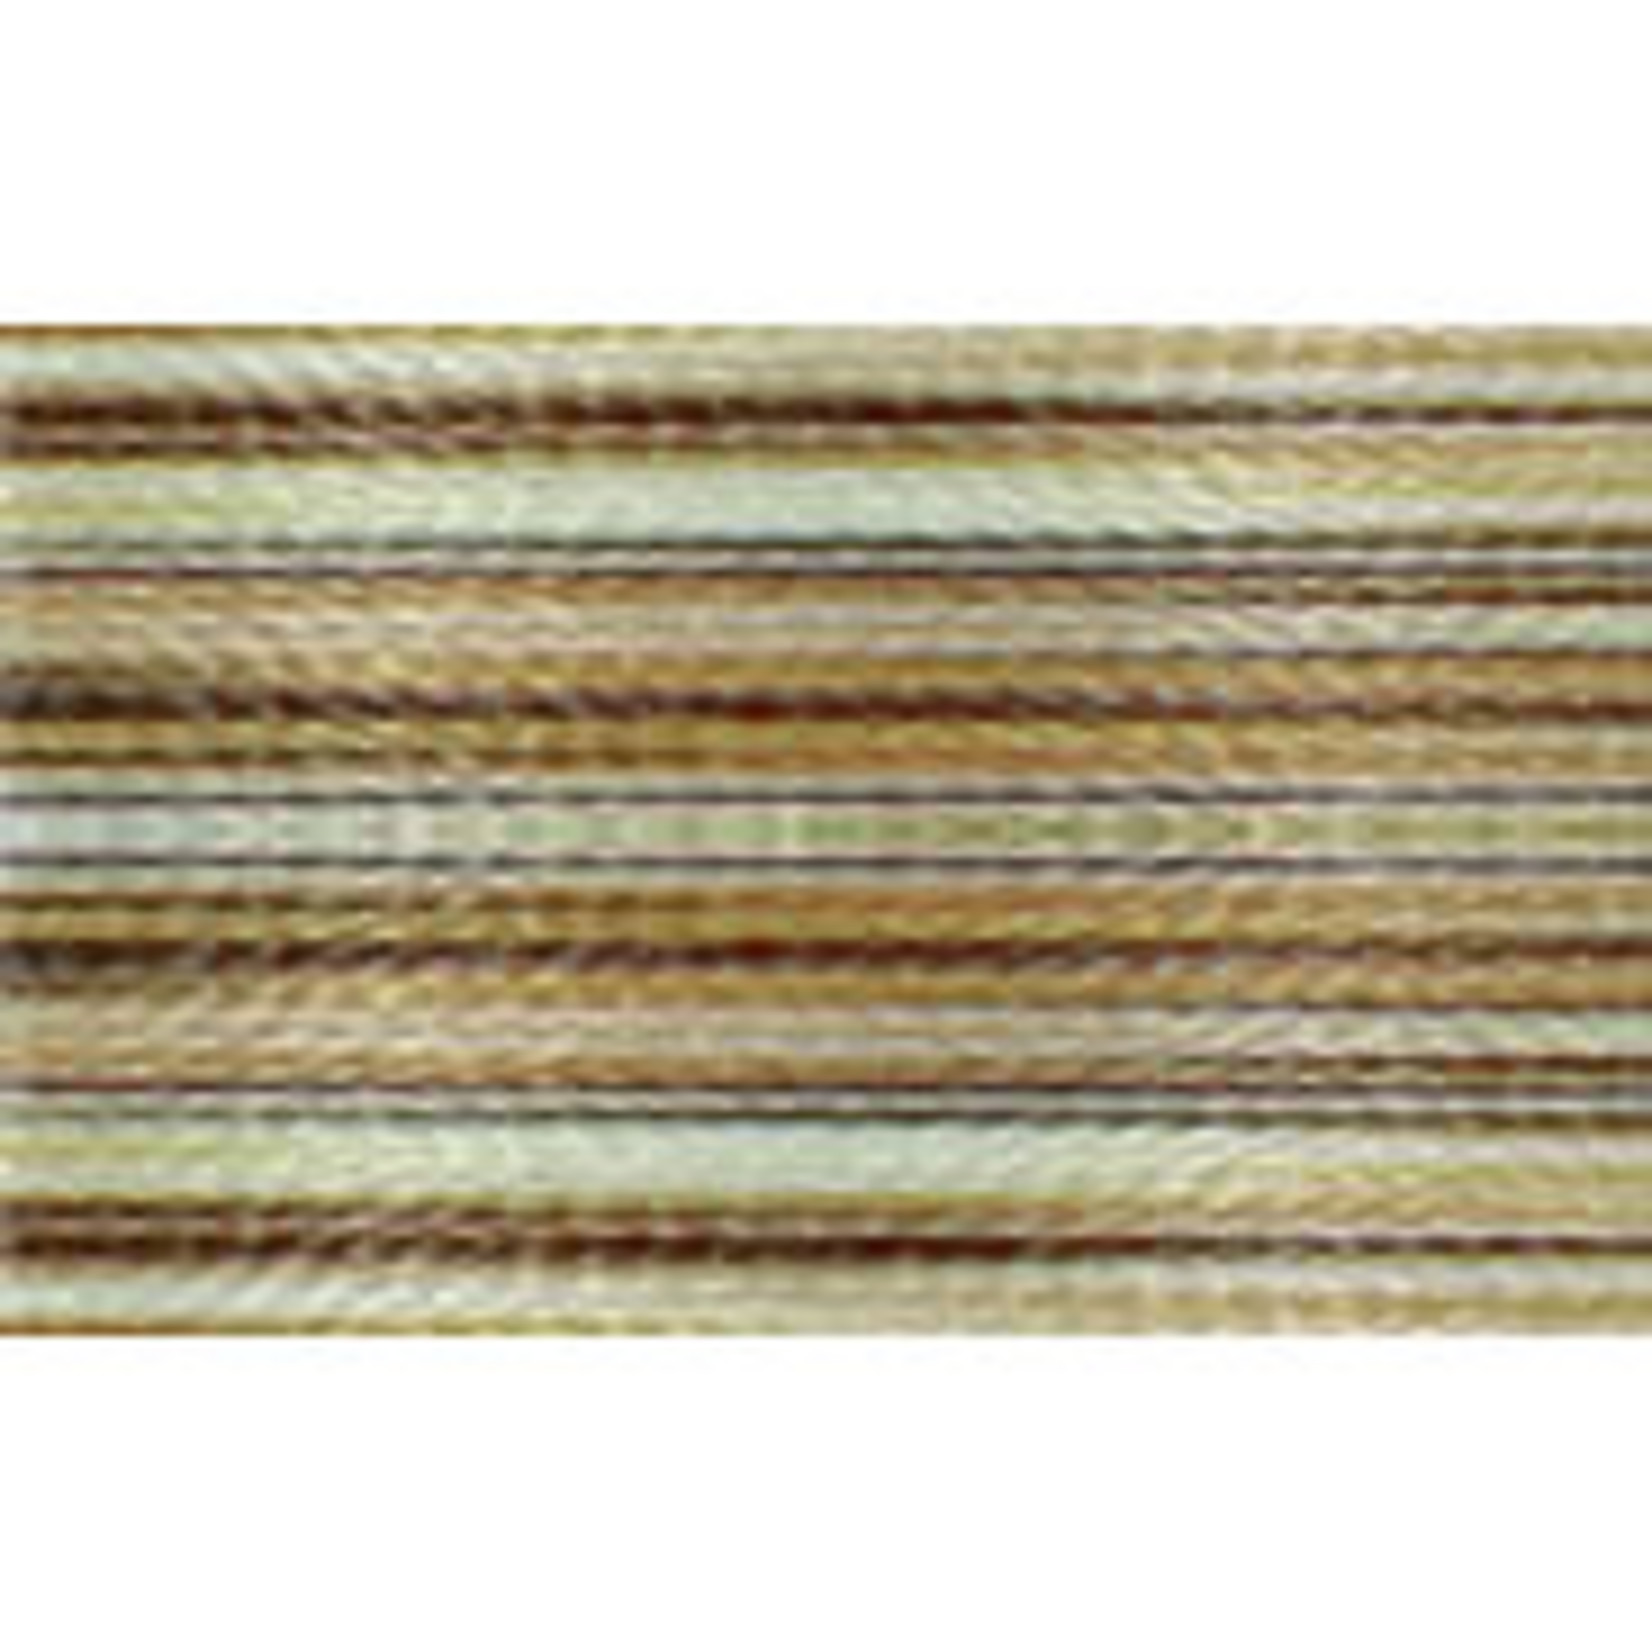 Amann Mettler Isacord Multi - #40 - 1000 m - 9805